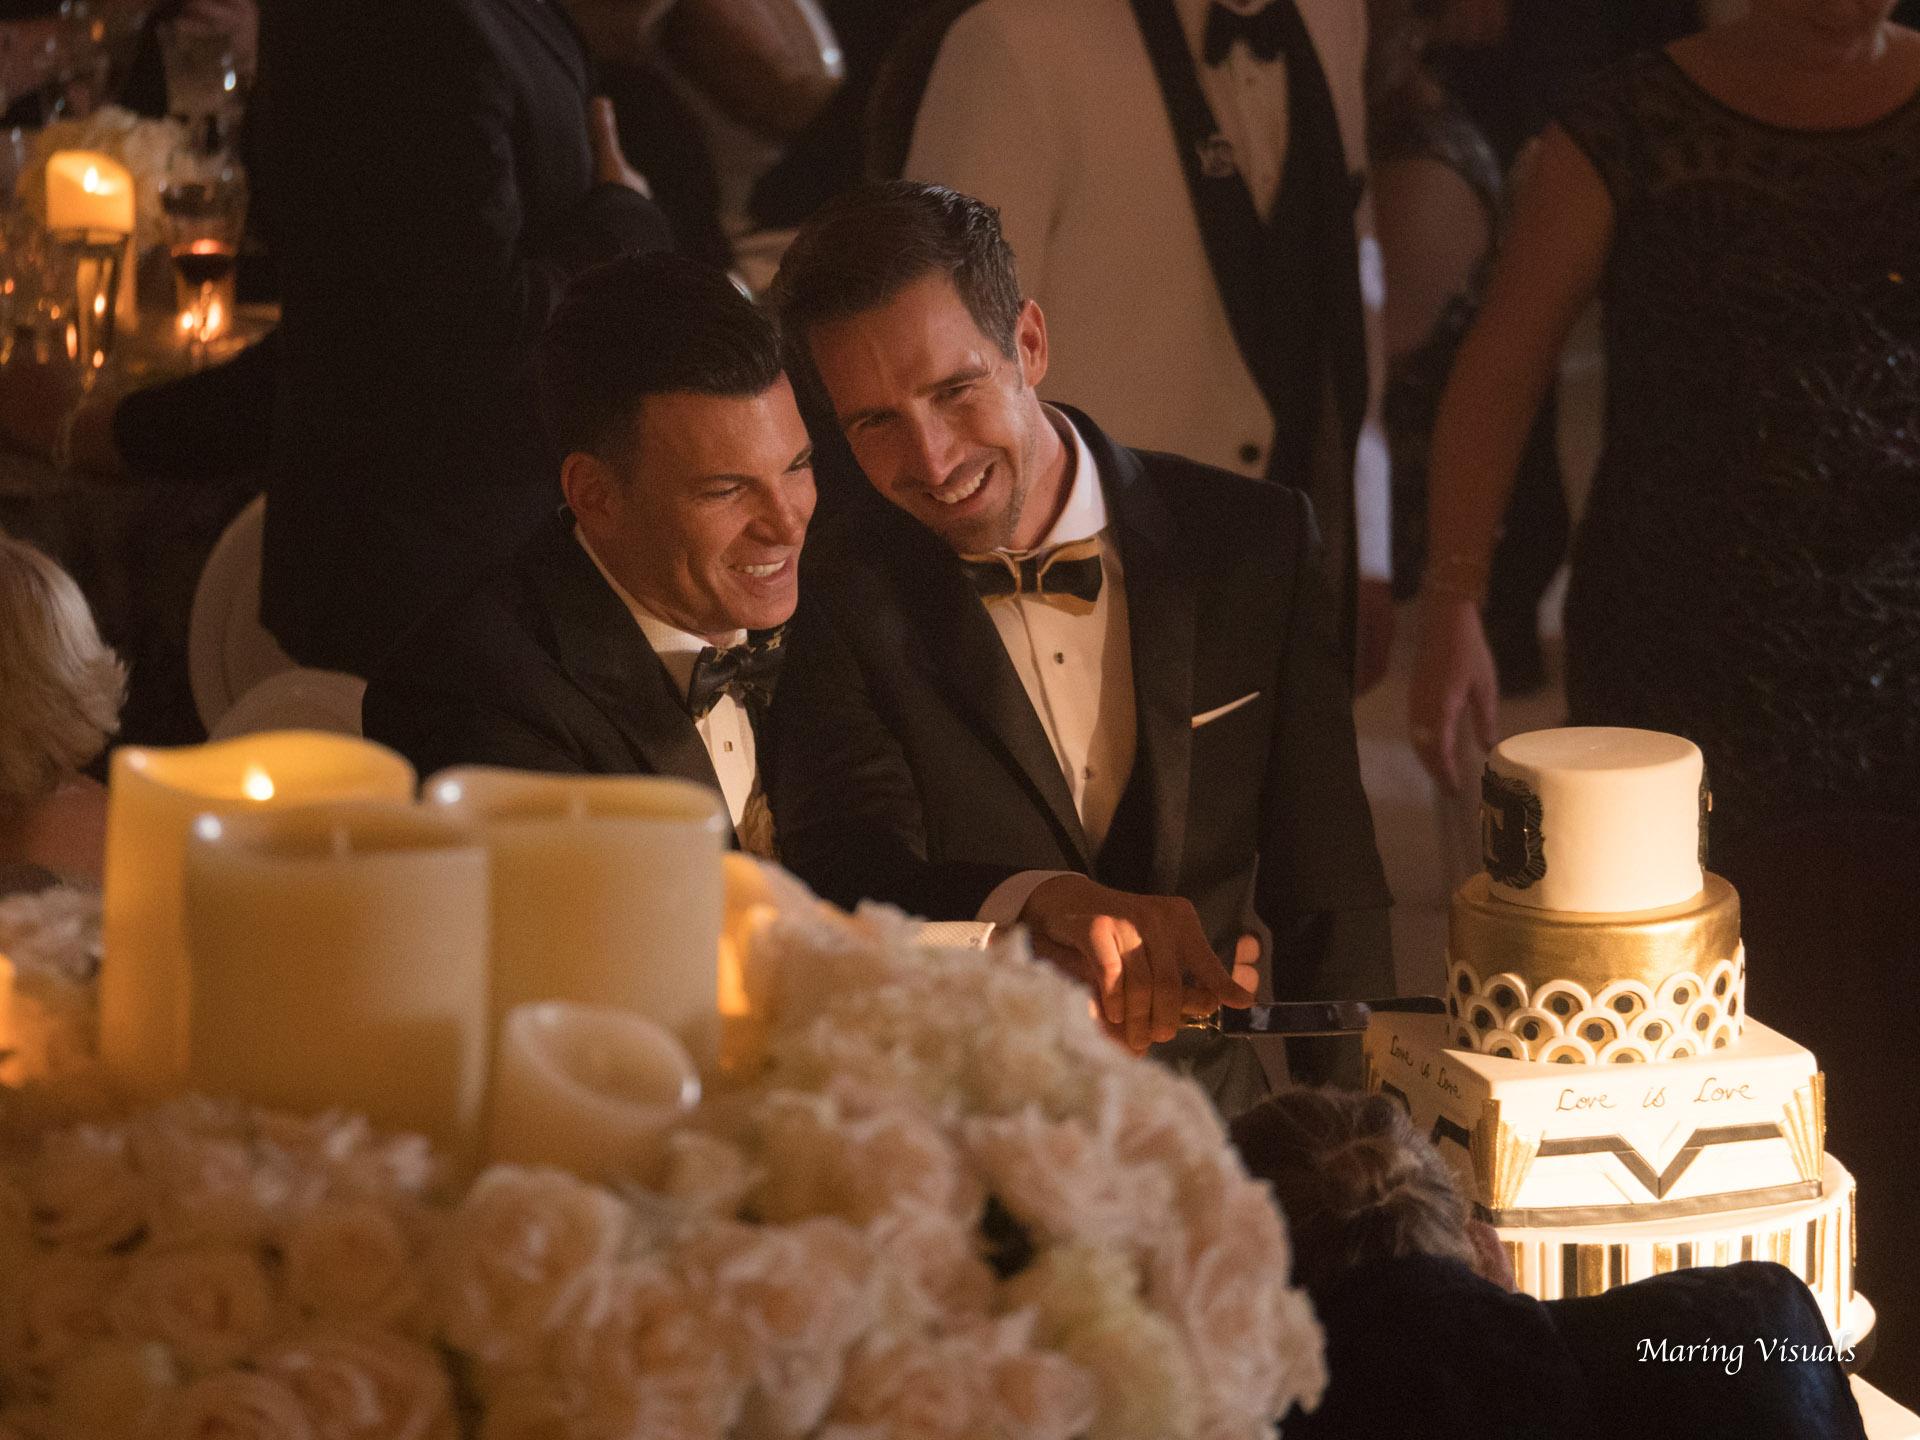 David Tutera Weddings by Maring Visuals 00578.jpg